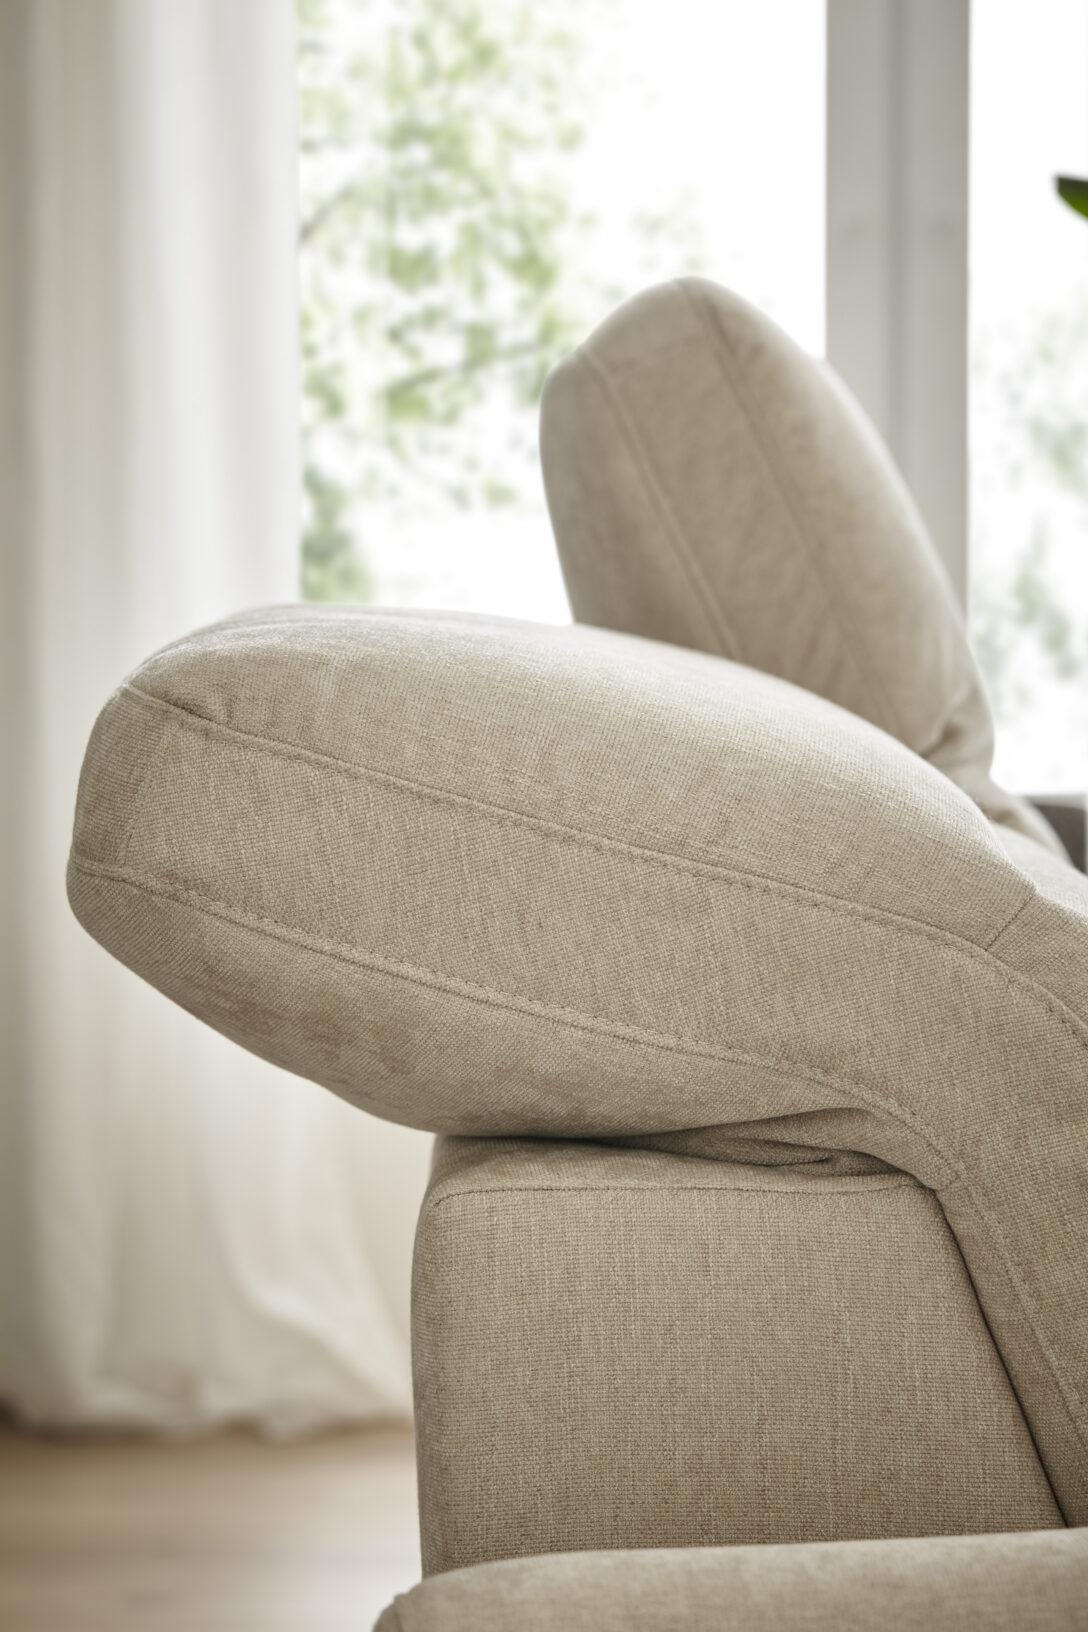 Large Size of Natura Sofa Gebraucht Love Livingston Denver Couch Kansas Brooklyn Home Pasadena Newport Kaufen Kleines 3 Sitzer Michigan In Creme Farbenem Stoff Bezug Barock Sofa Natura Sofa